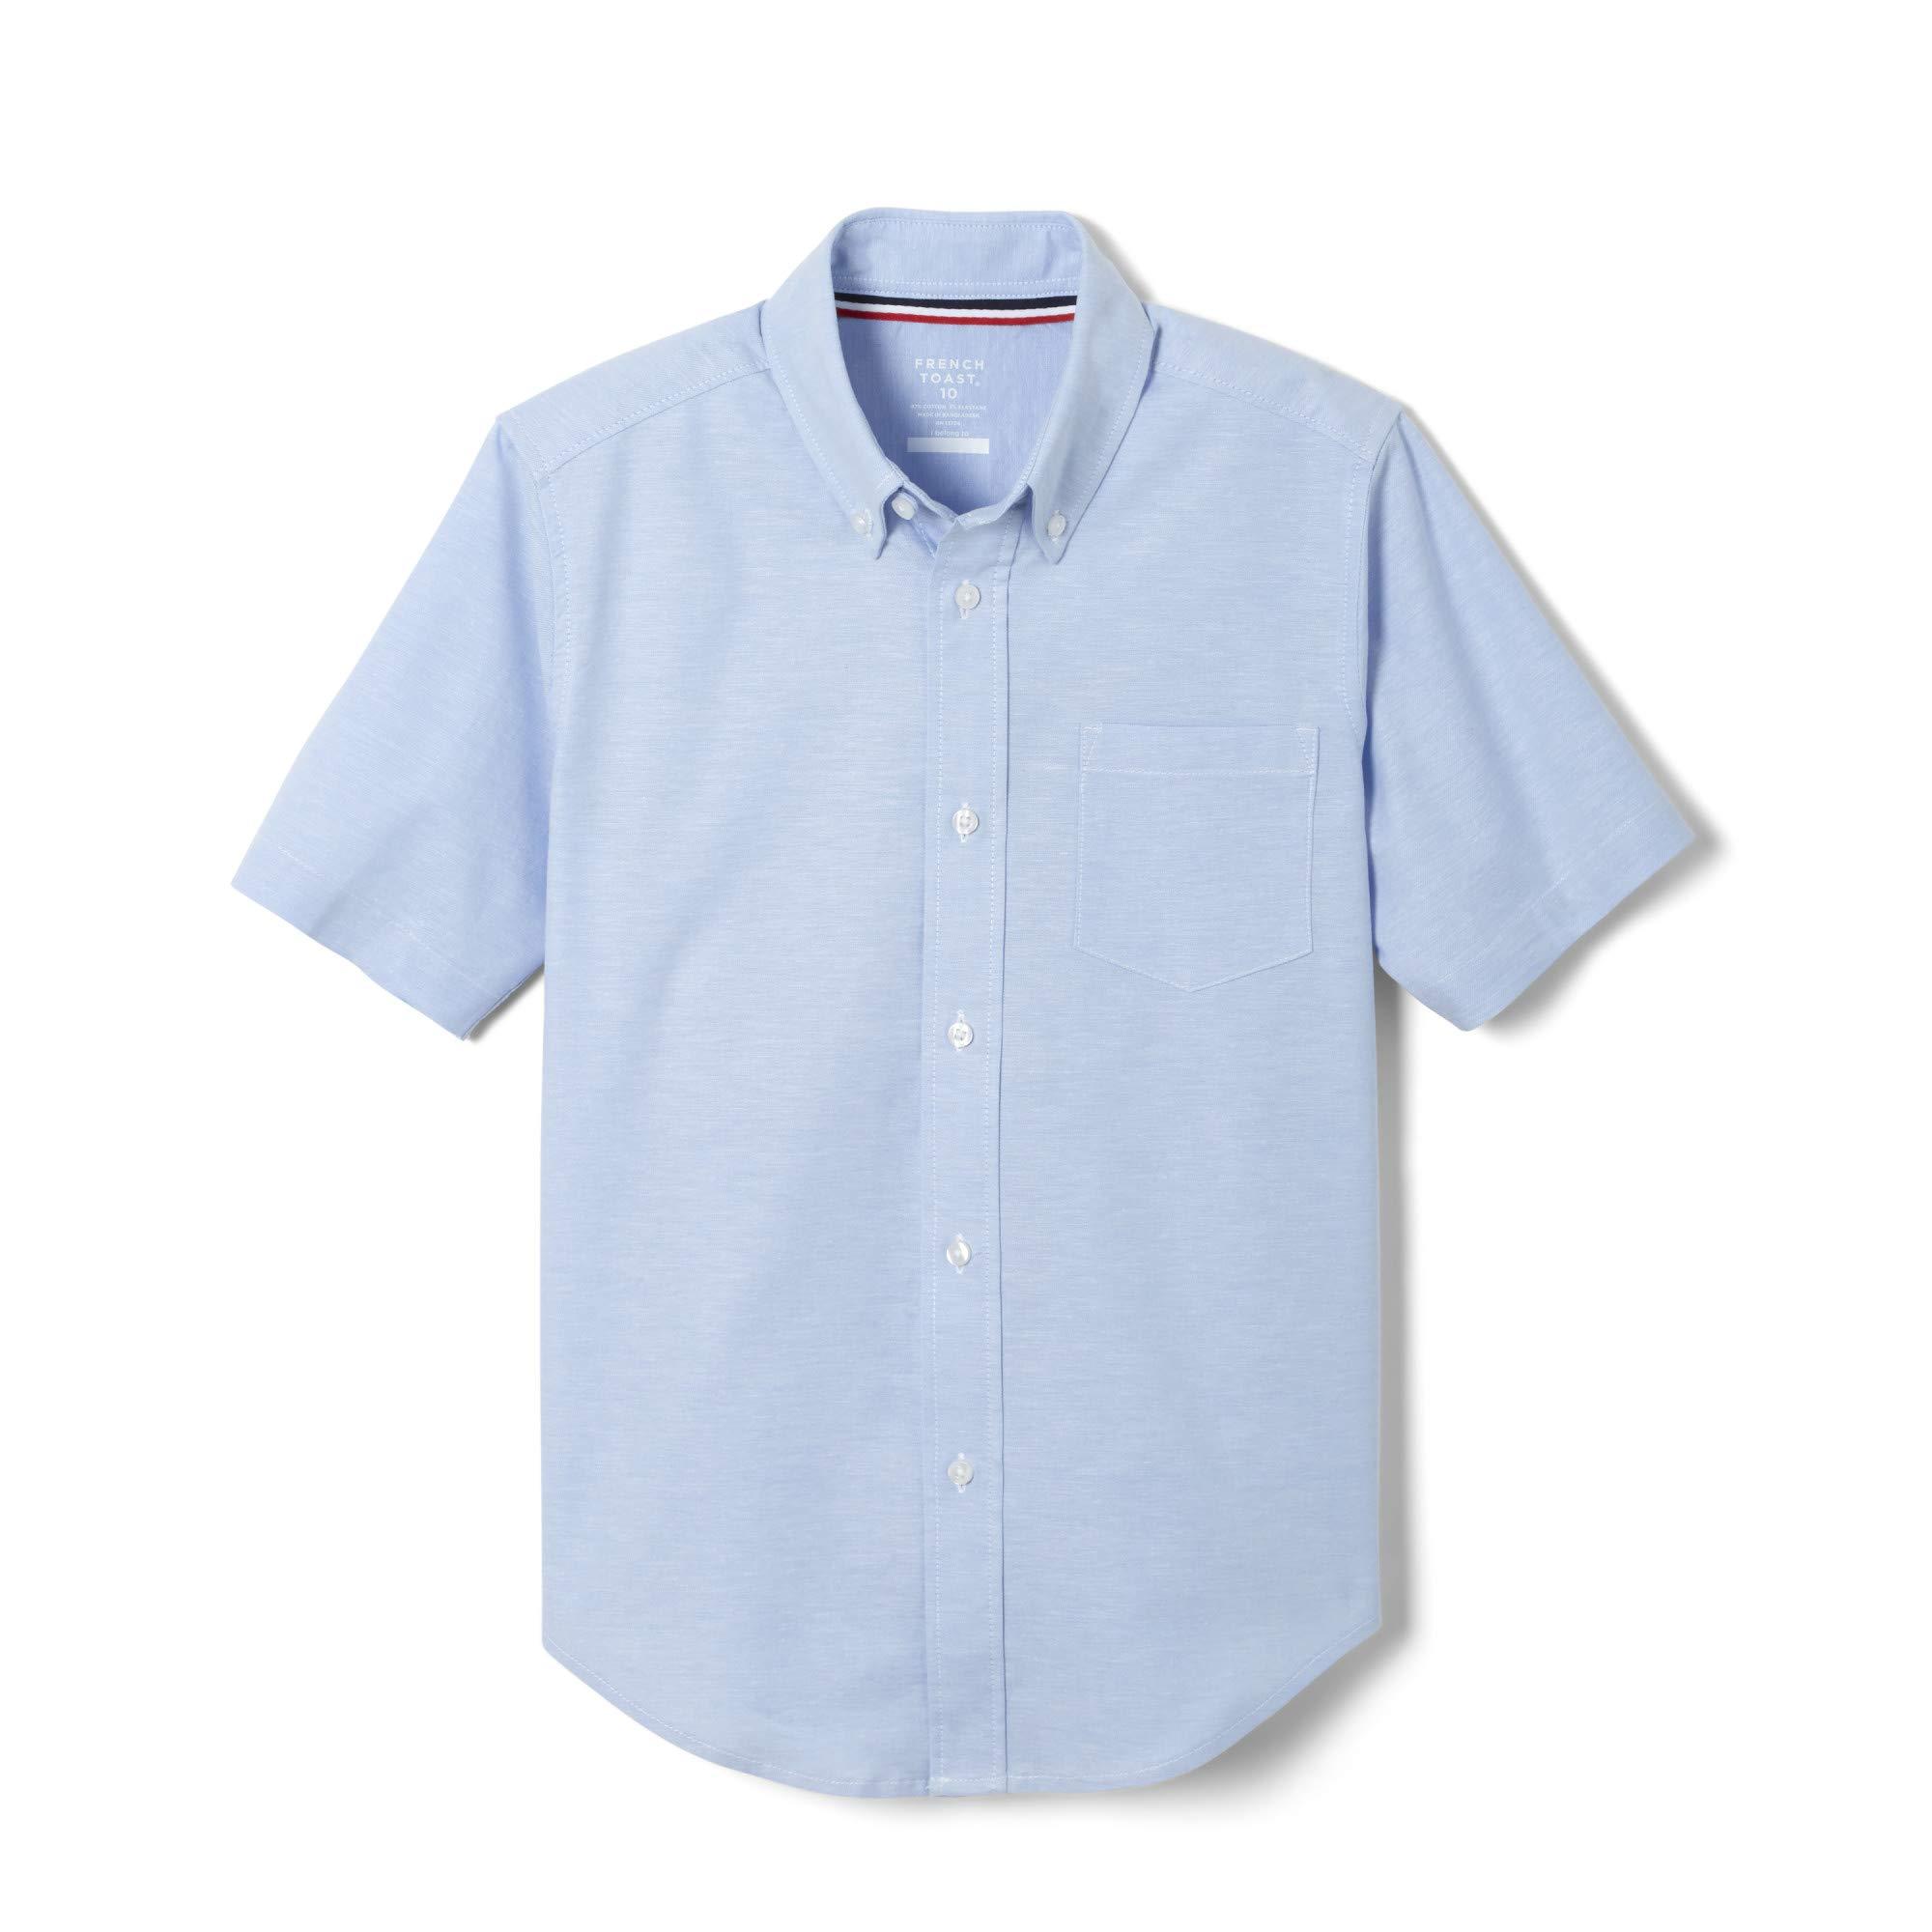 French Toast Boys' Big Short Sleeve Oxford Dress Shirt (Standard & Husky), Light Blue Stretch, 8